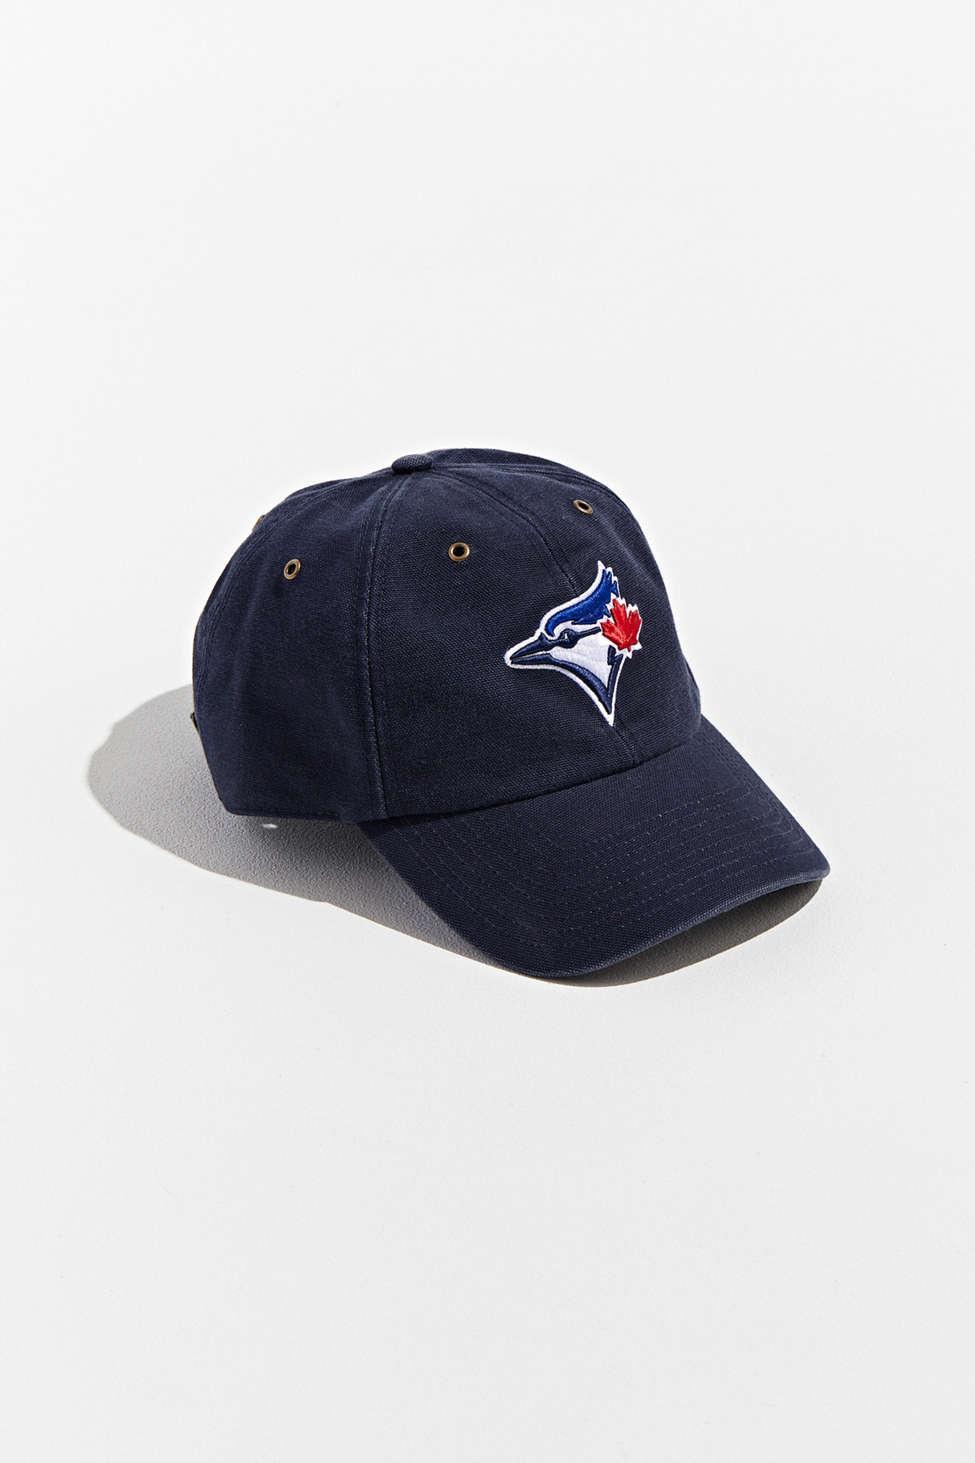 b76d8b27e7d45 47 Brand X Carhartt Toronto Blue Jays Dad Baseball Hat in Blue for ...